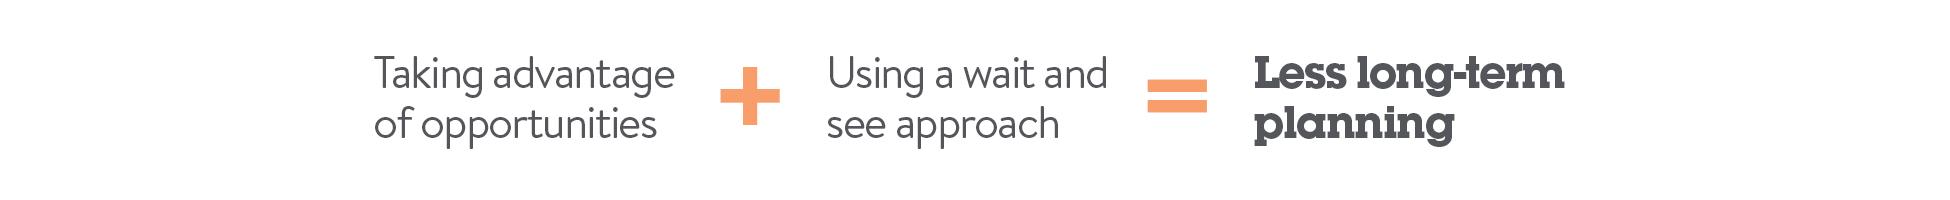 less long-term planning